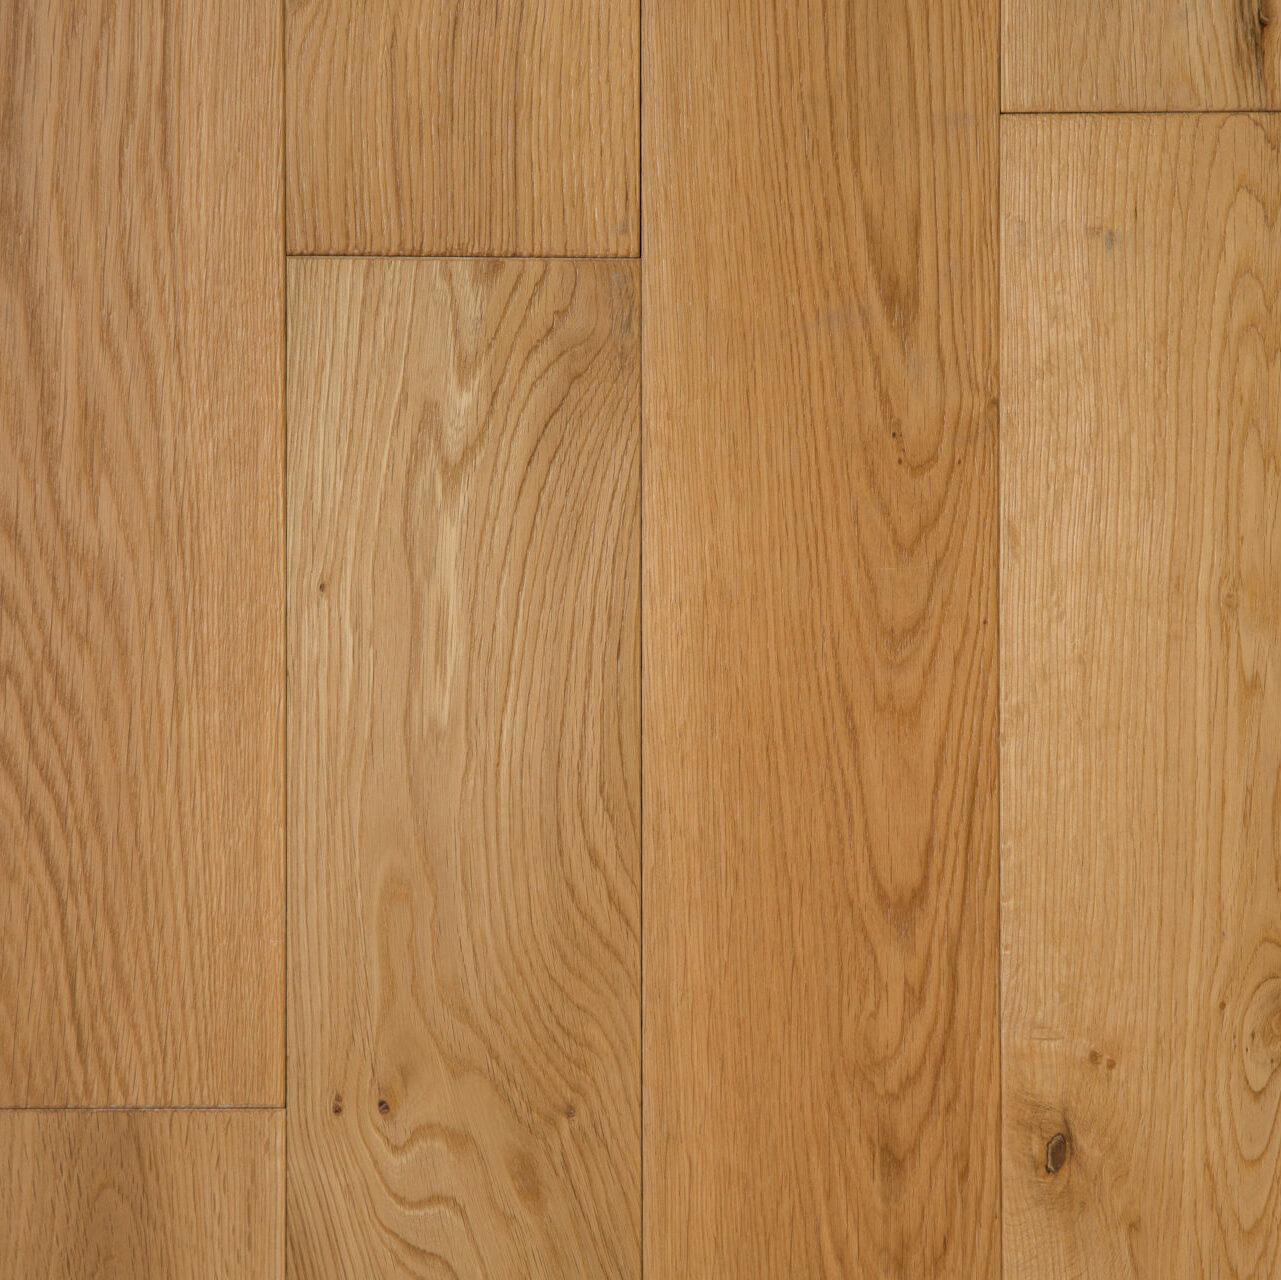 Wood Parquet Flooring - Solid-caracas